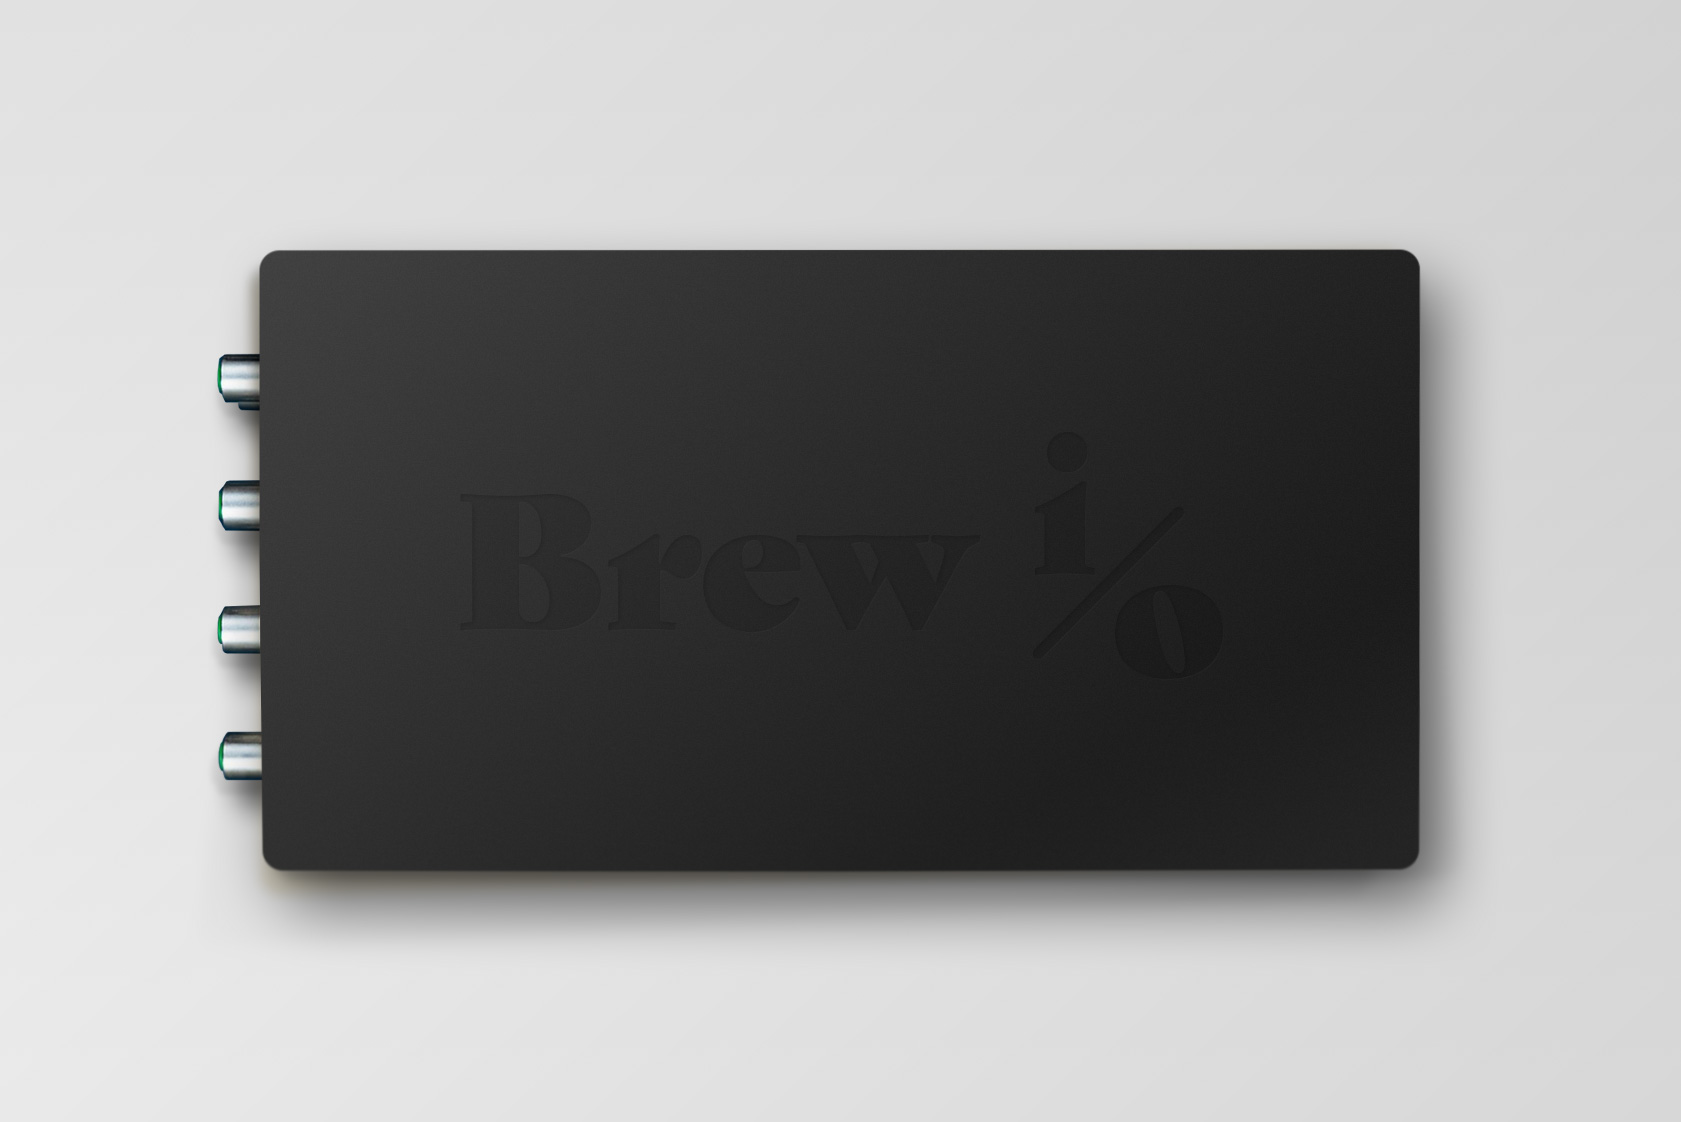 Brew I/O Industrial IoT